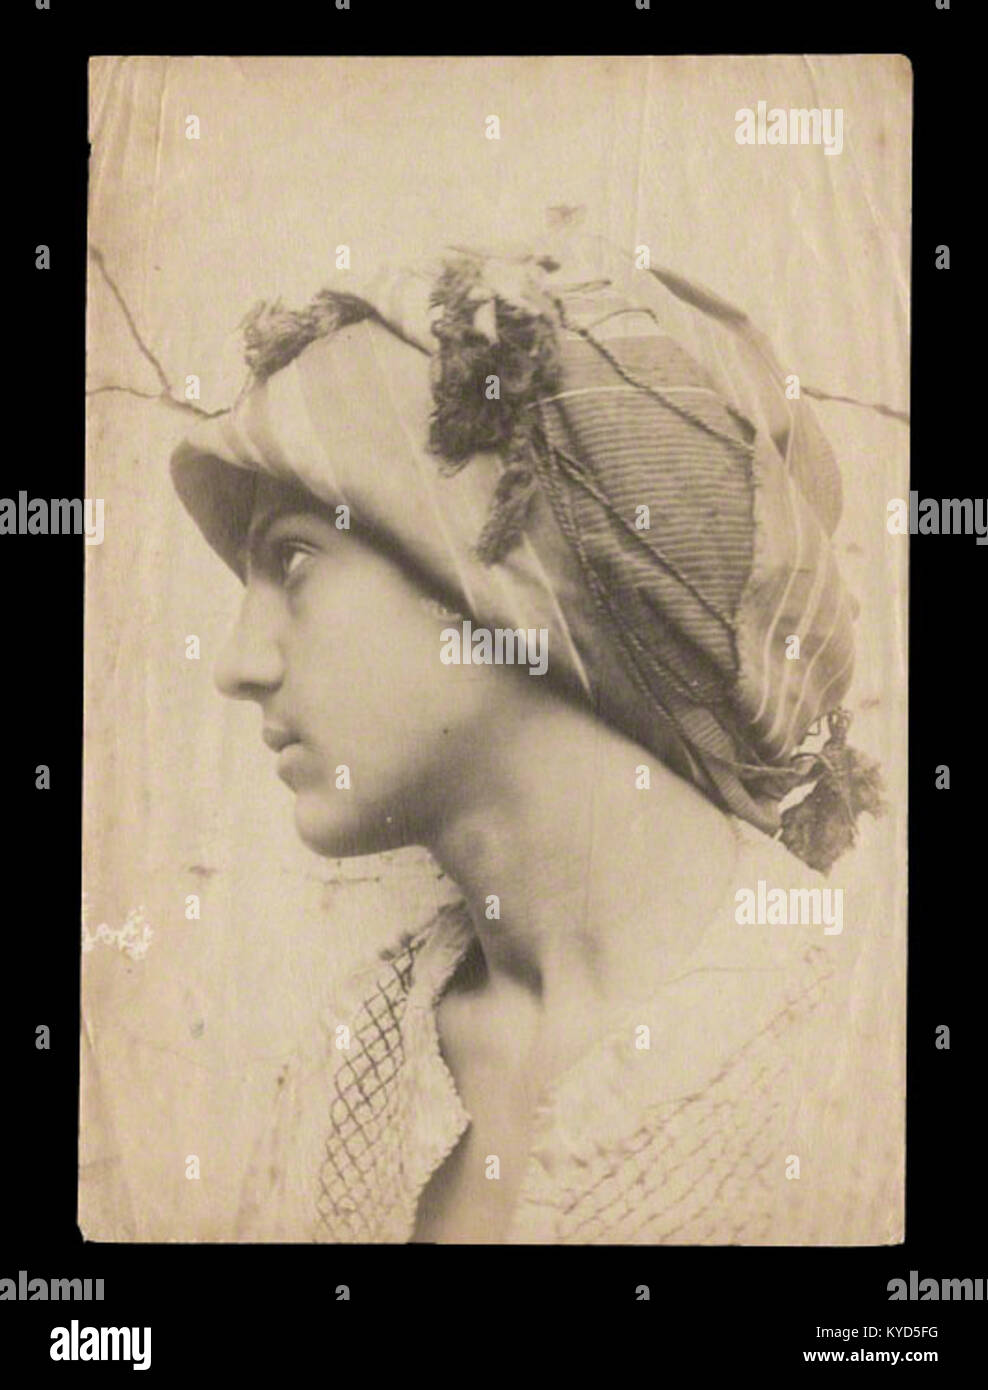 Pluschow, Wilhelm von (1852-1930) - n. 1298 - Galdi col turbante - da - p arcadiennes Immagini Stock